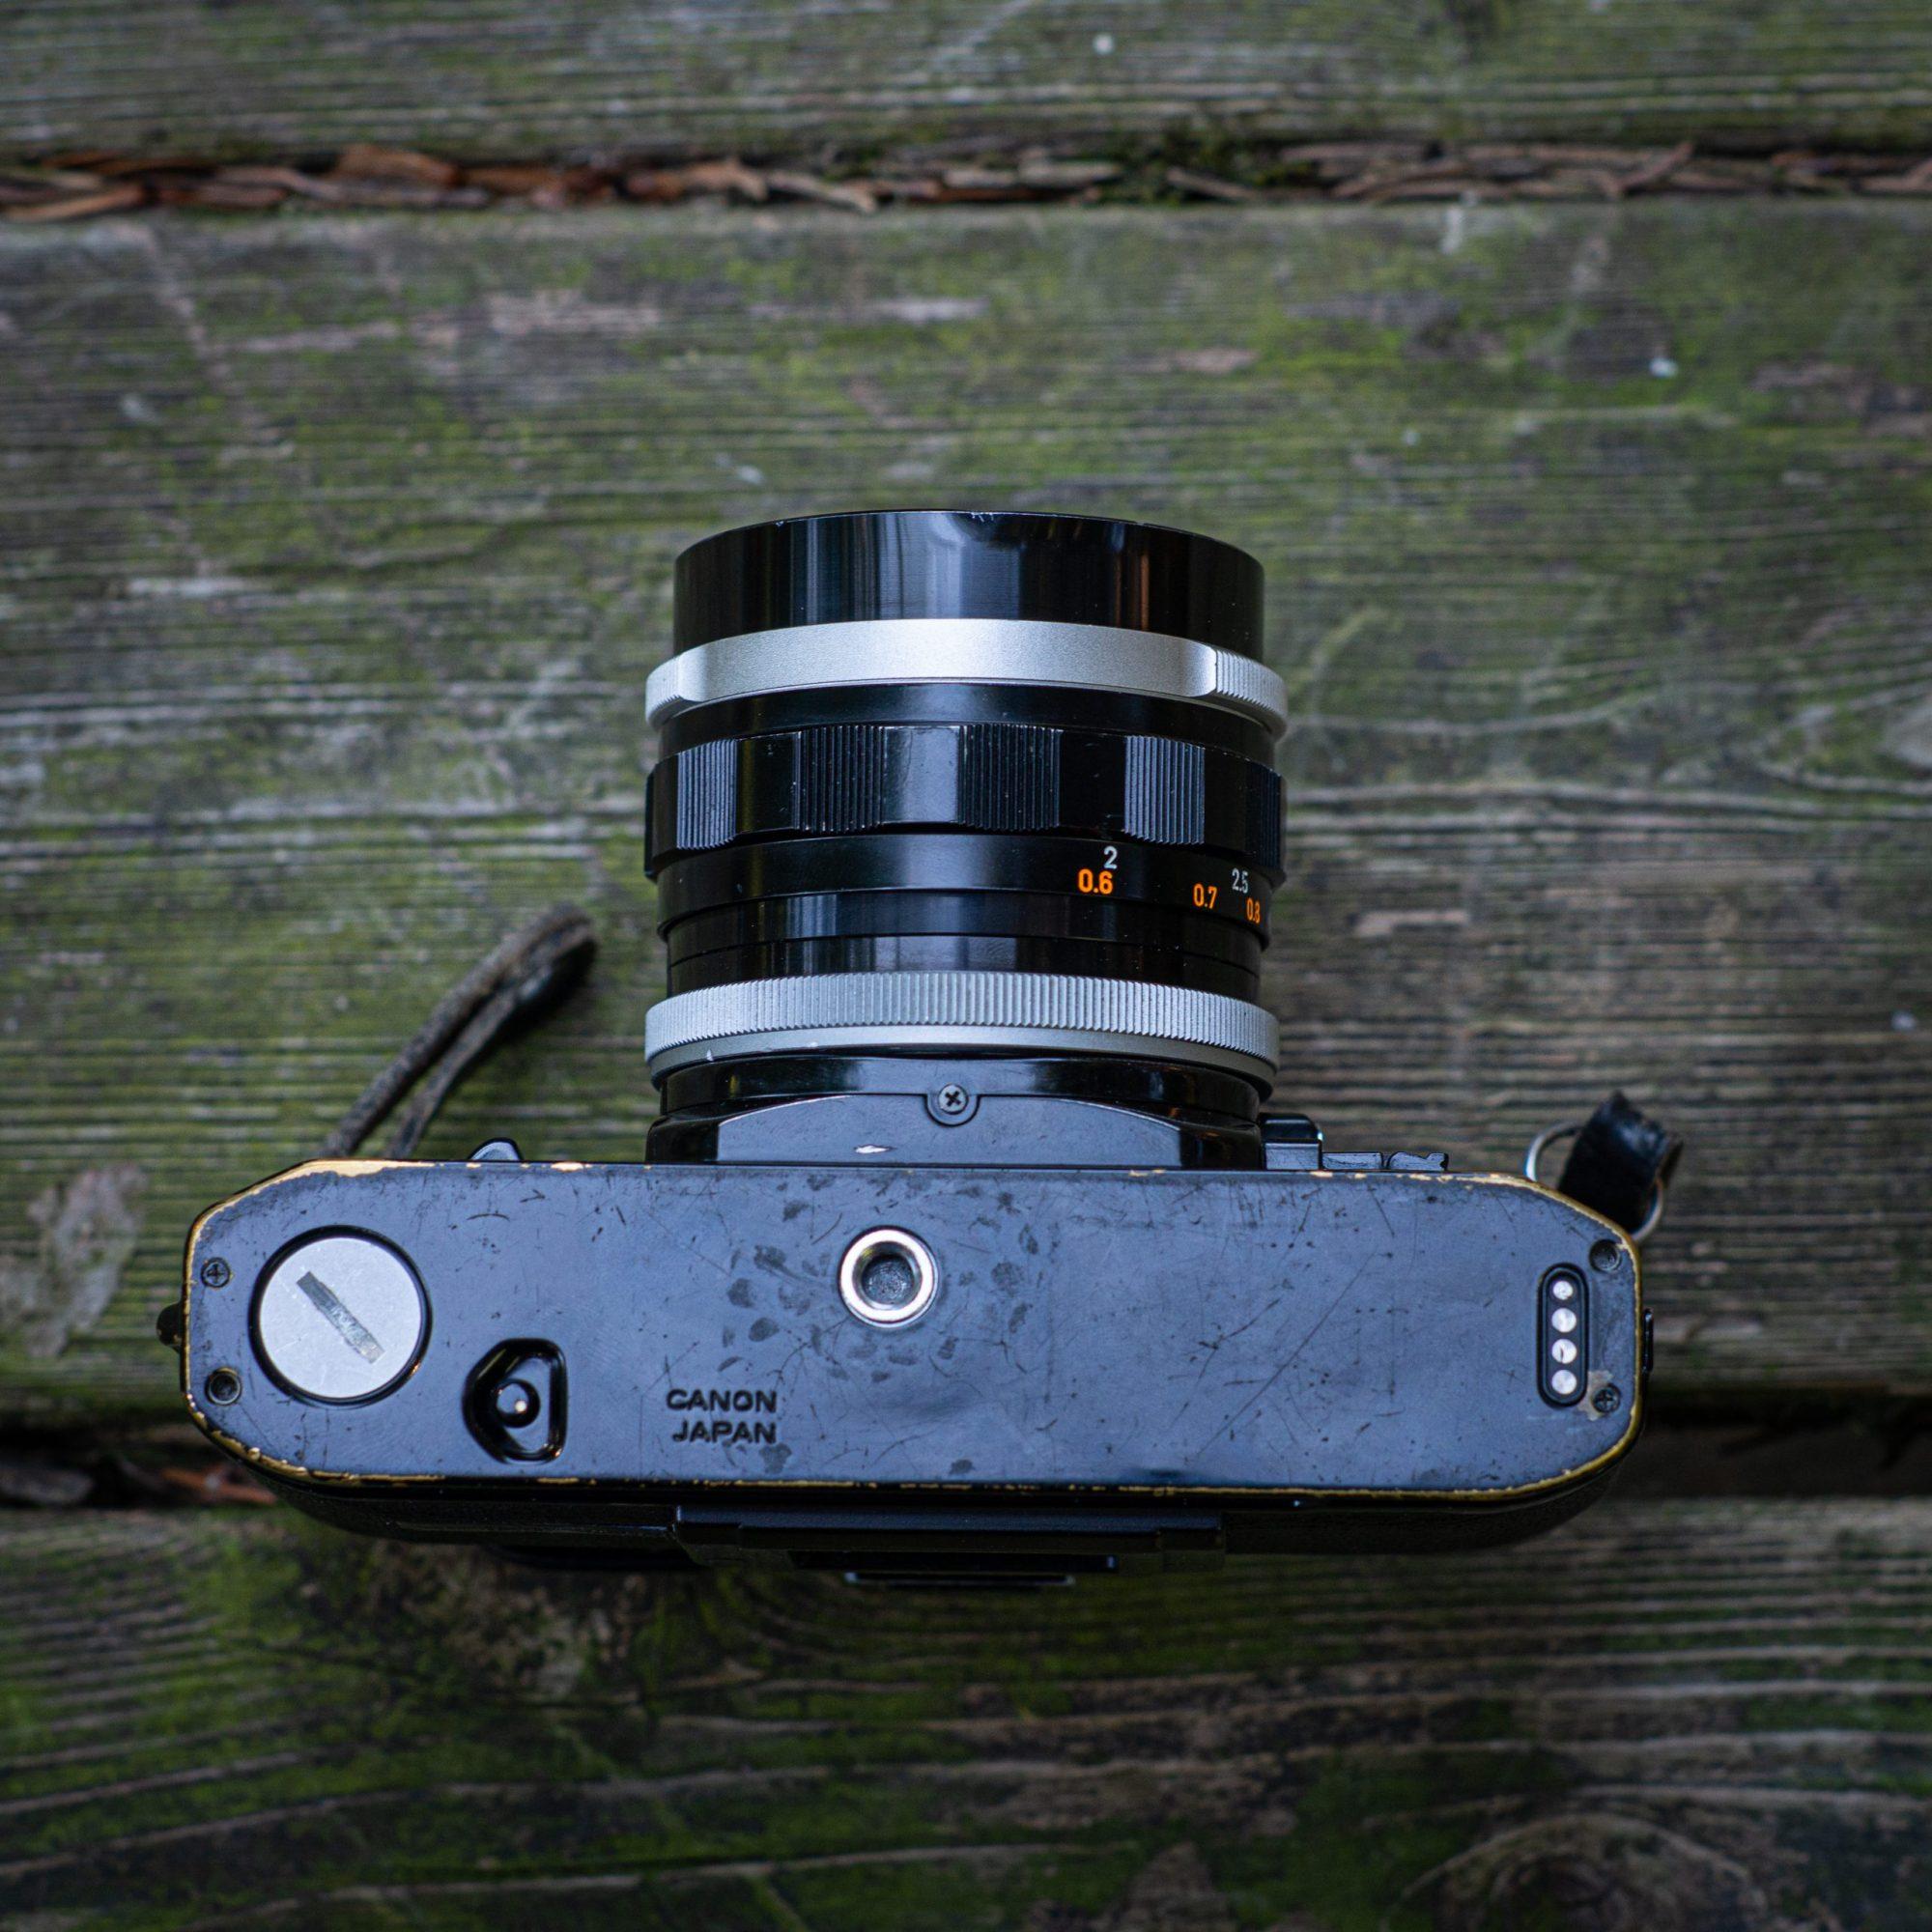 Bottom of Canon camera